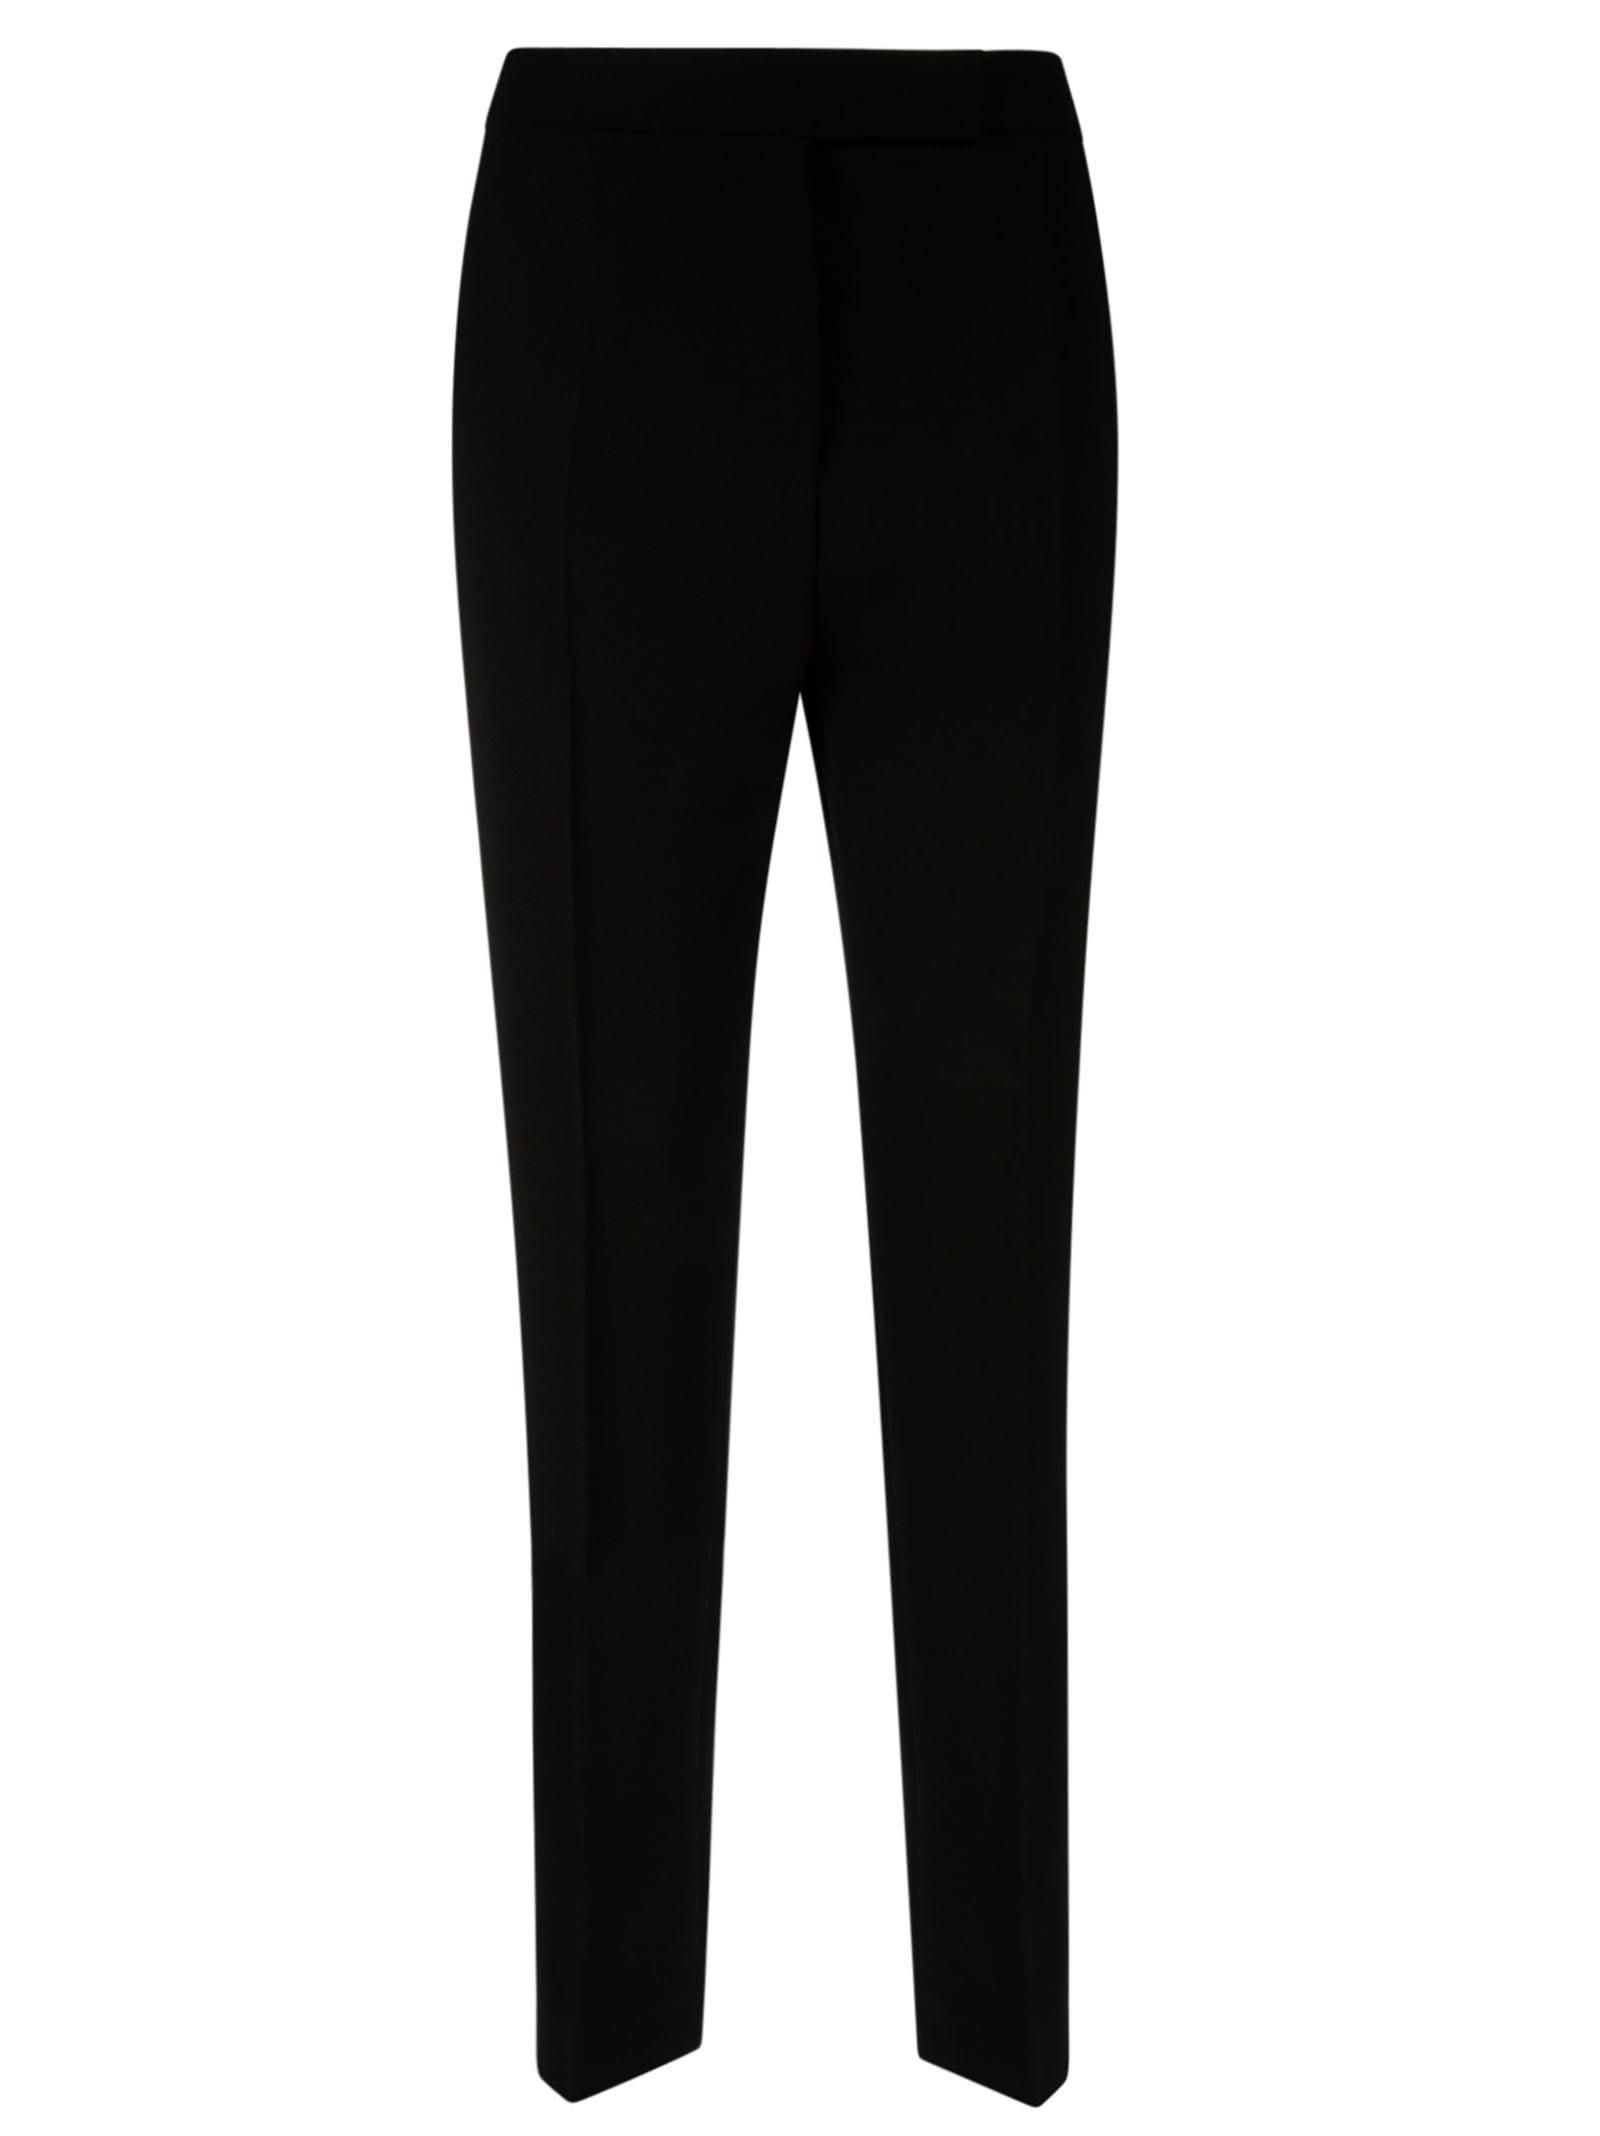 Max Mara Pianoforte Straight Trousers